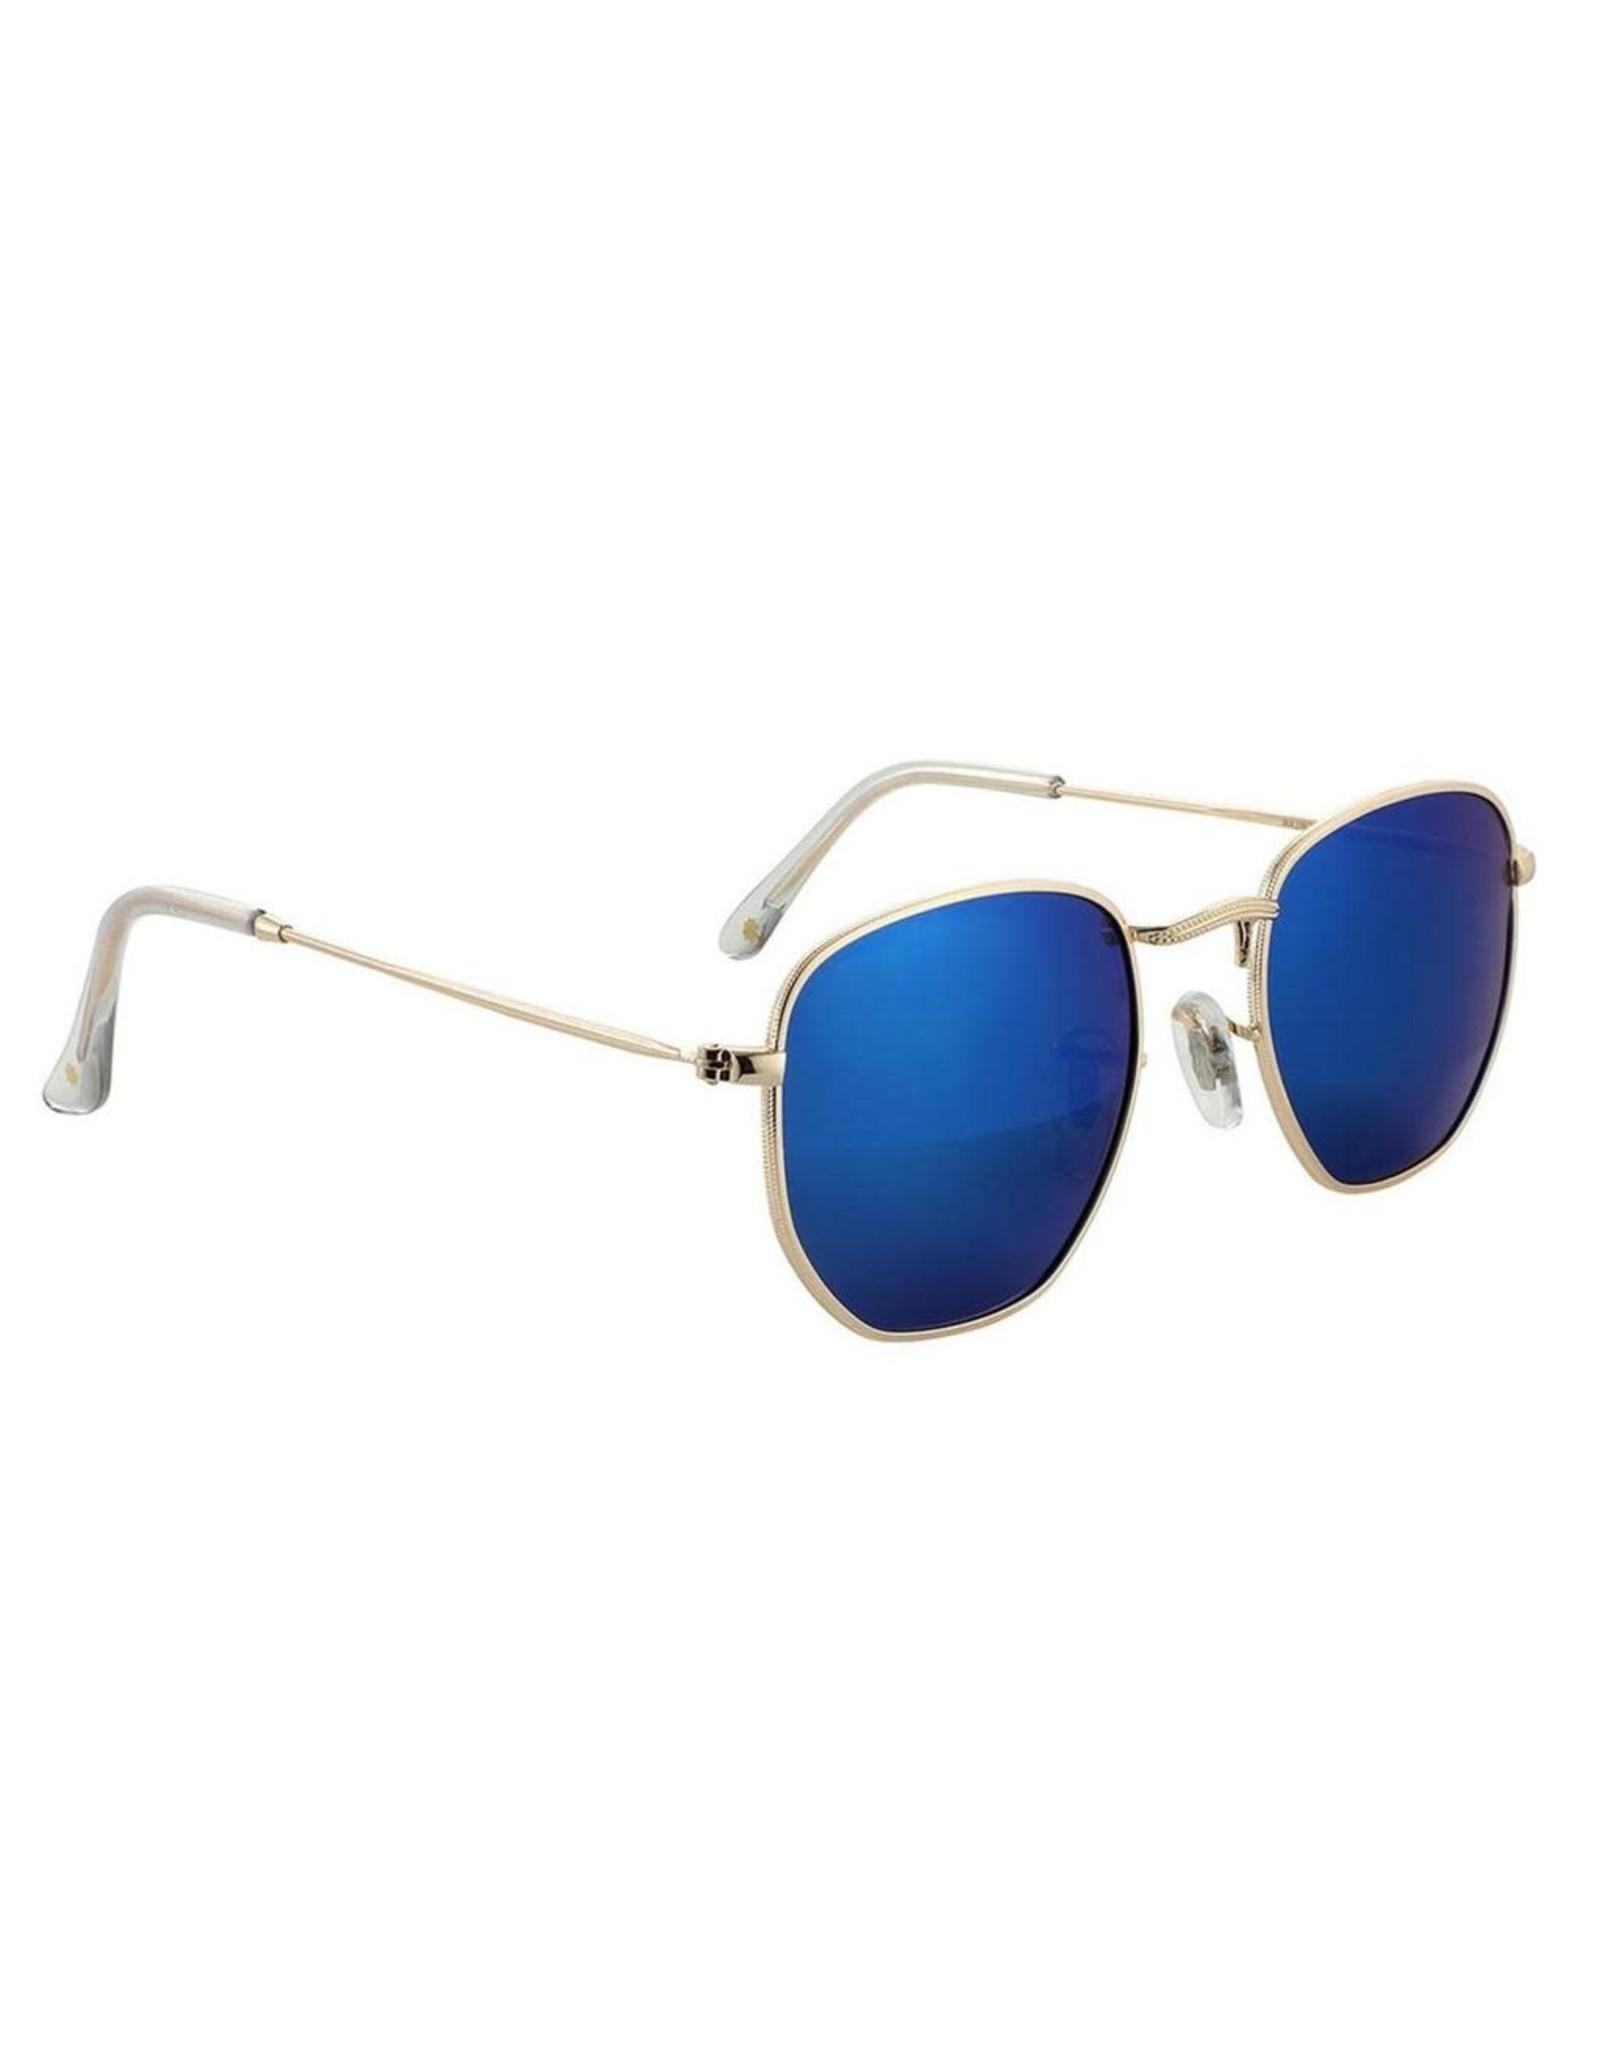 Glassy - Lunette soleil homme turner polarized gold/blue mirror